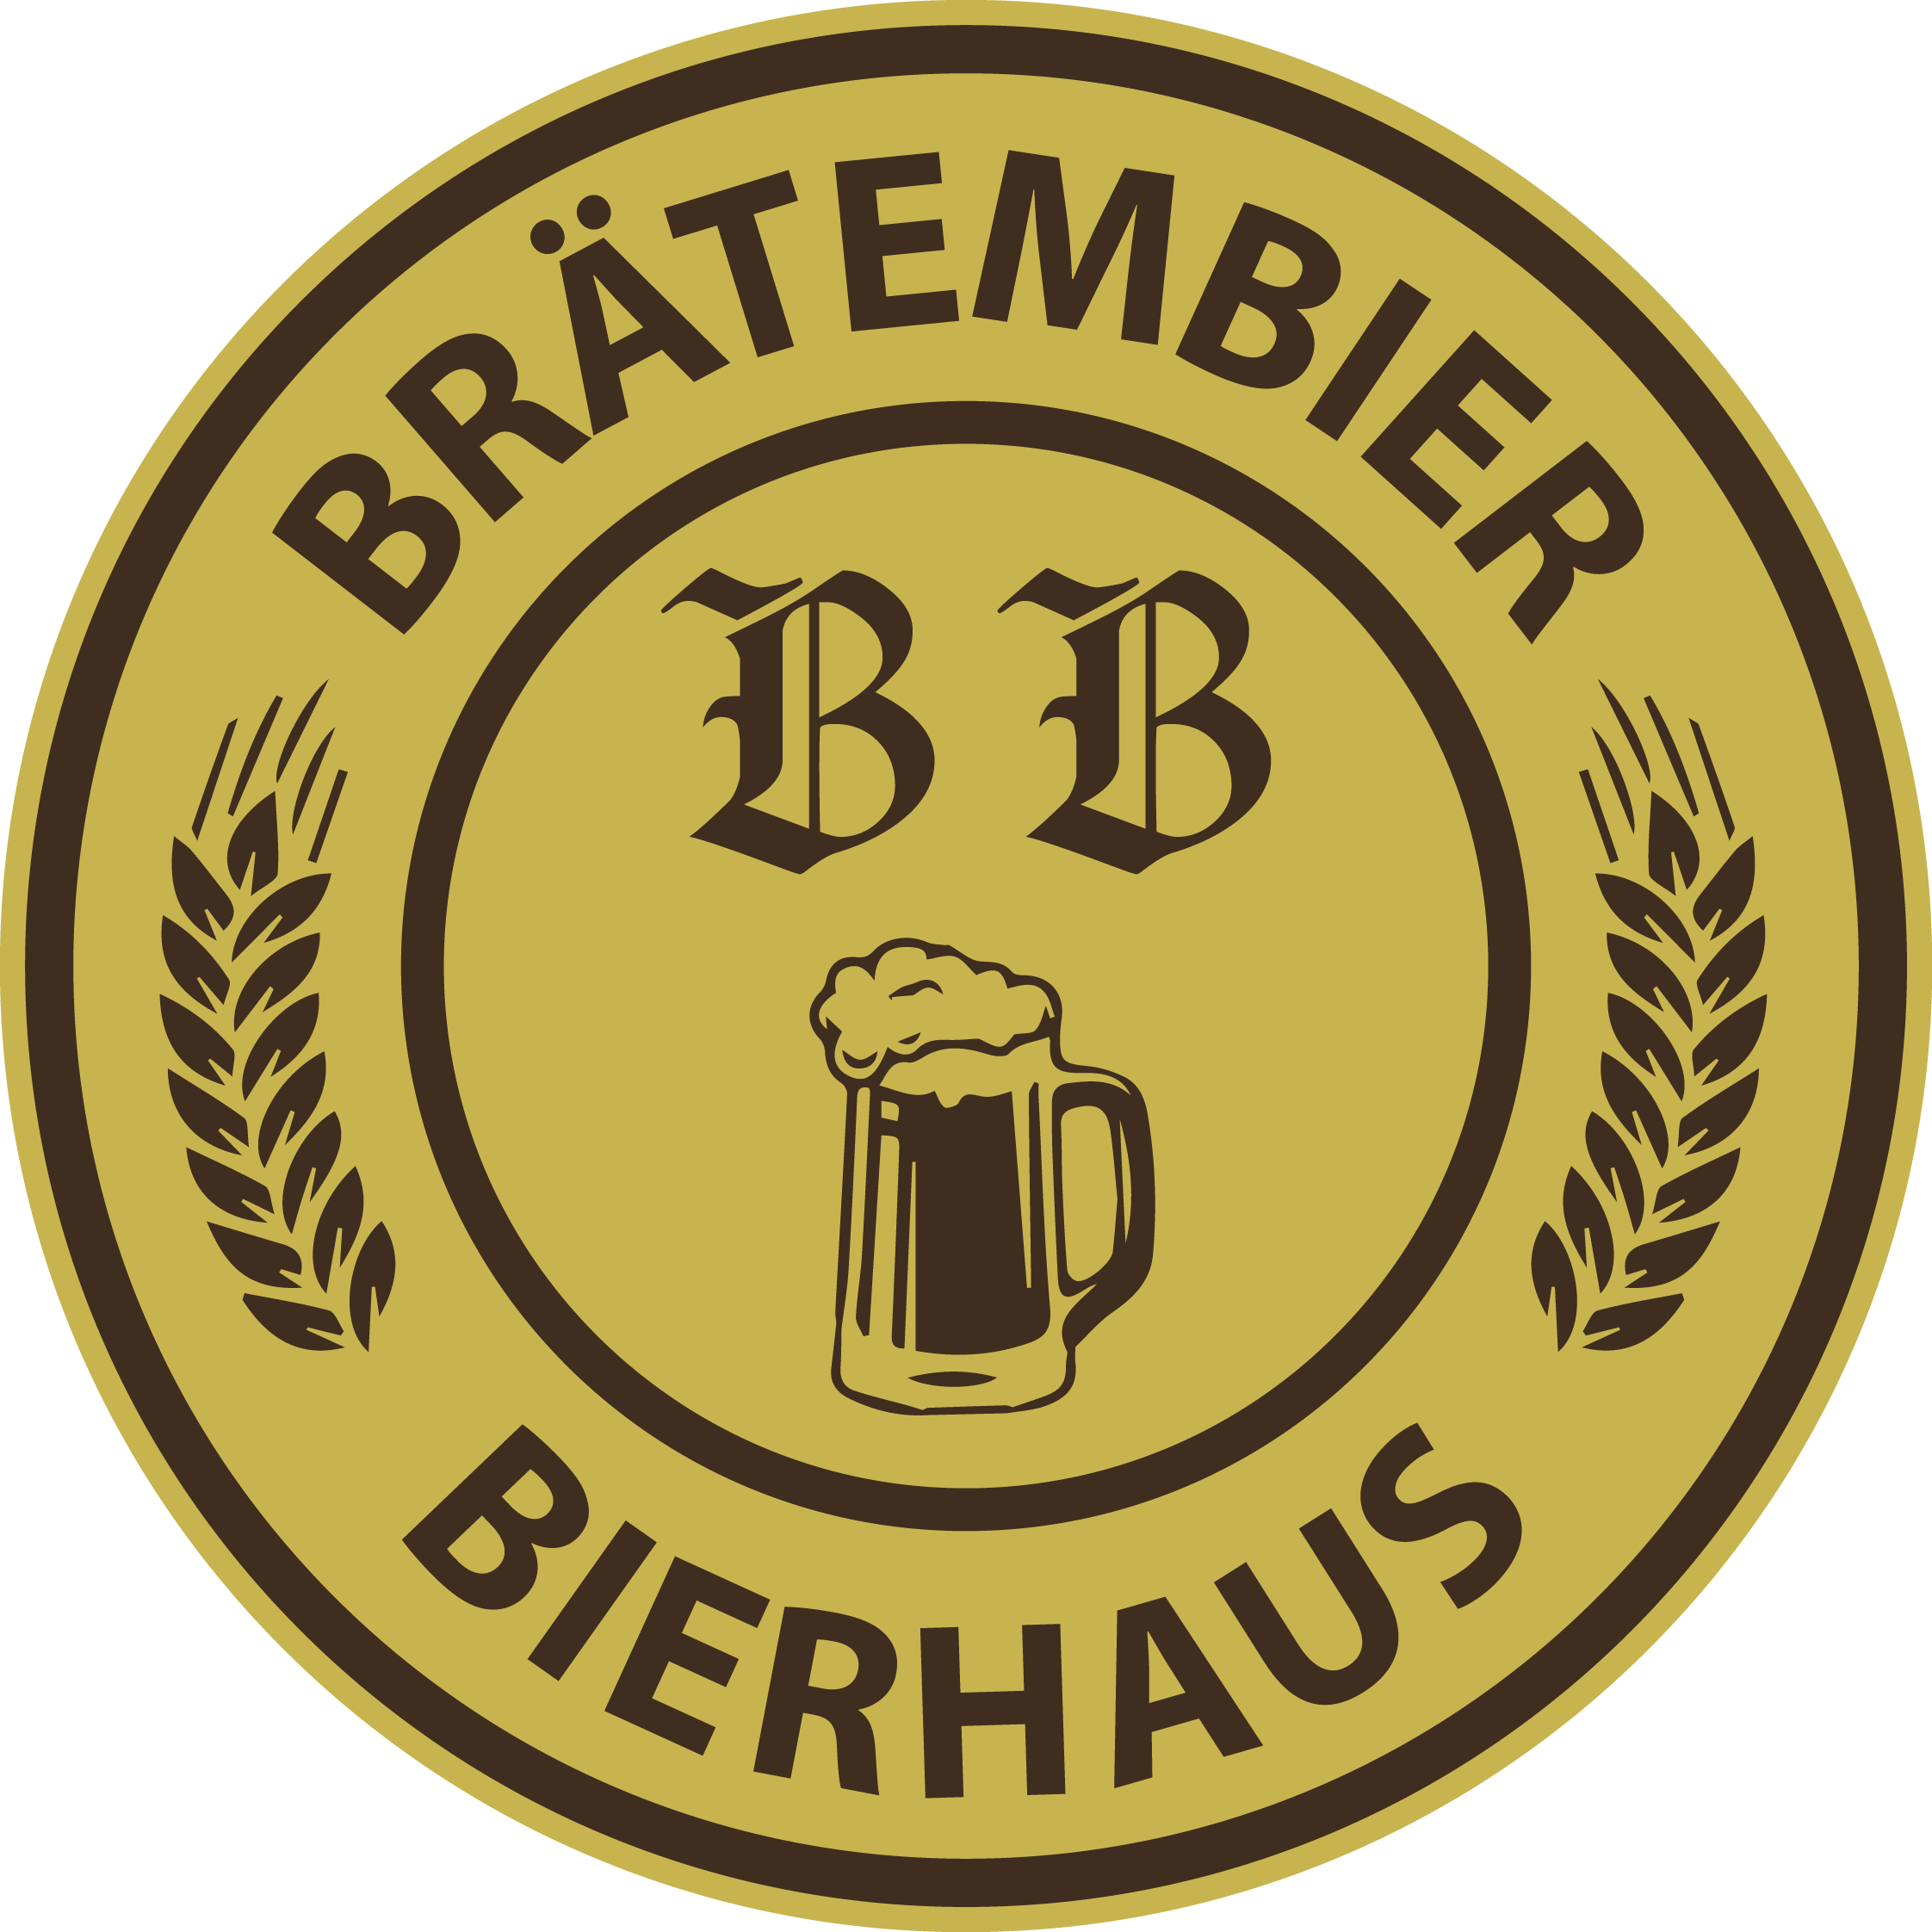 Brätembier Bierhaus